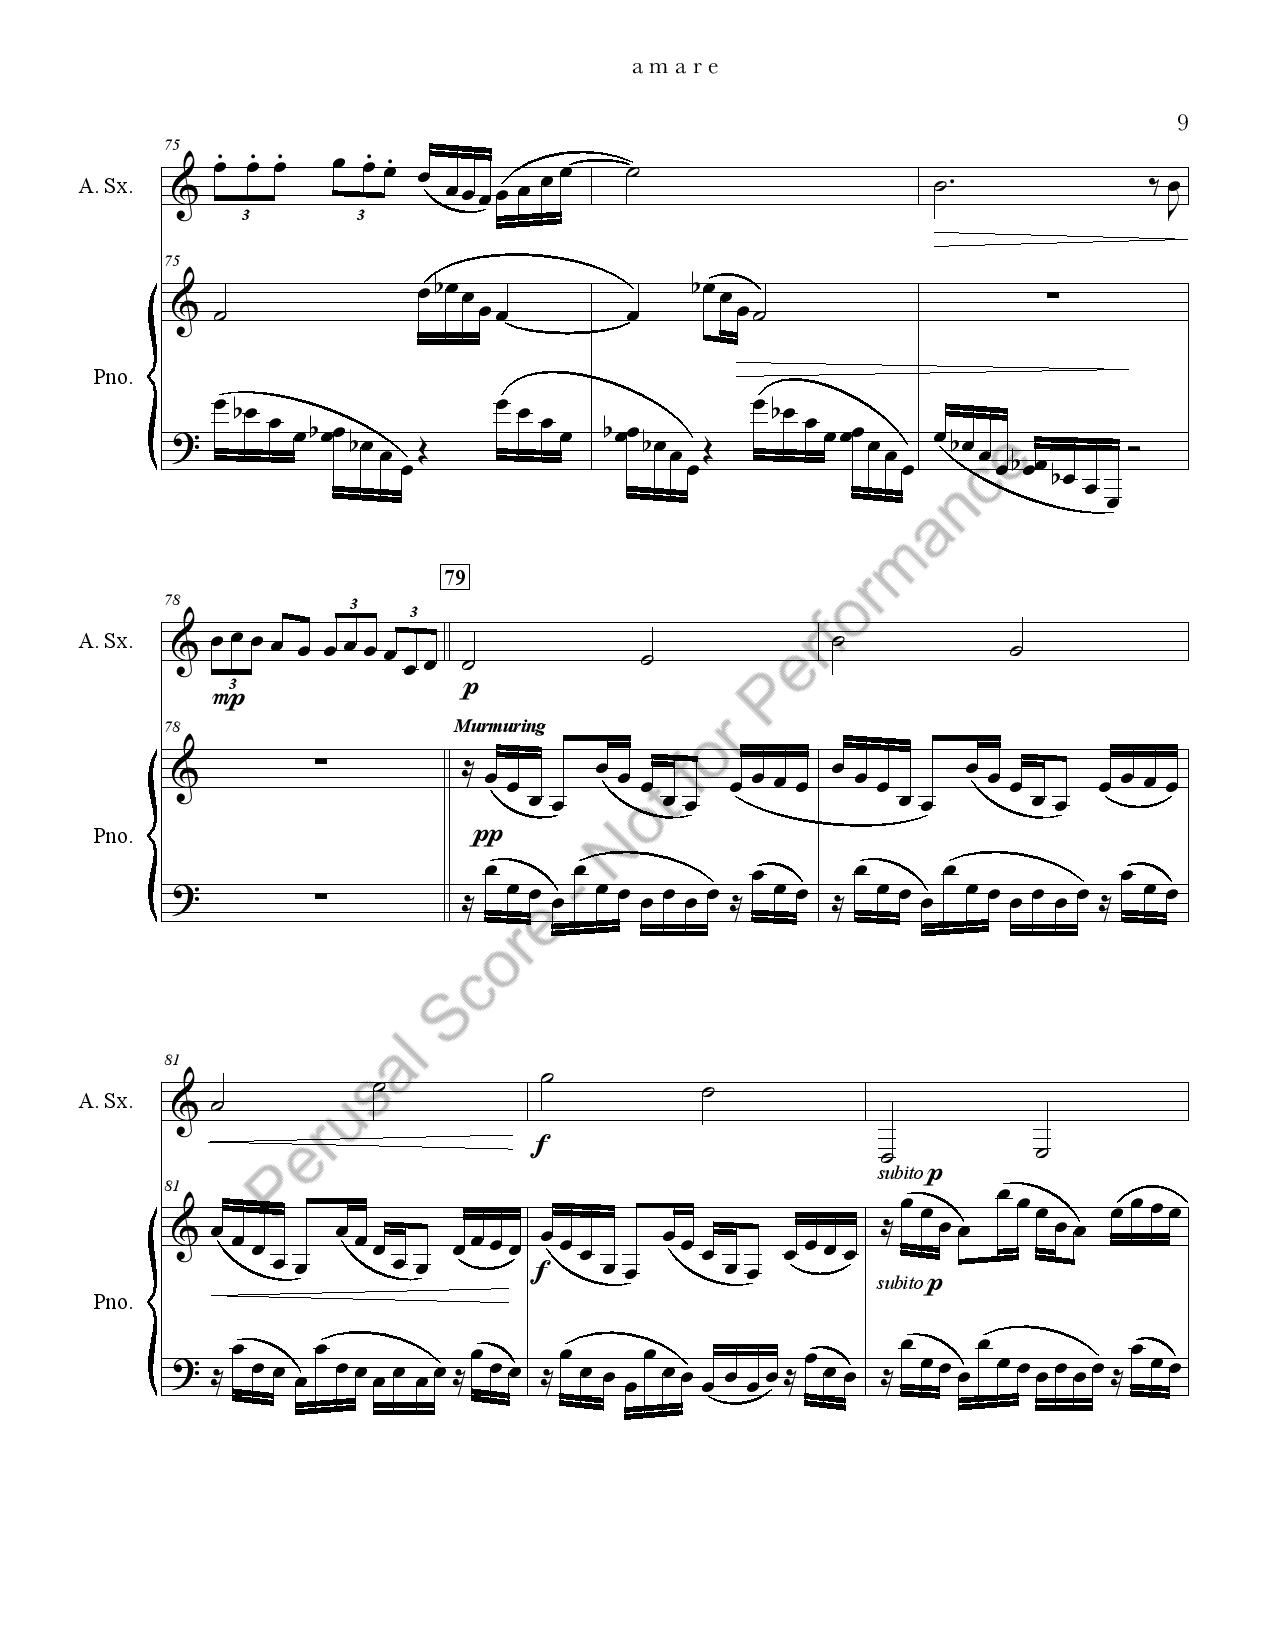 Boyd Amare Score_watermark-3-page-015.jpg